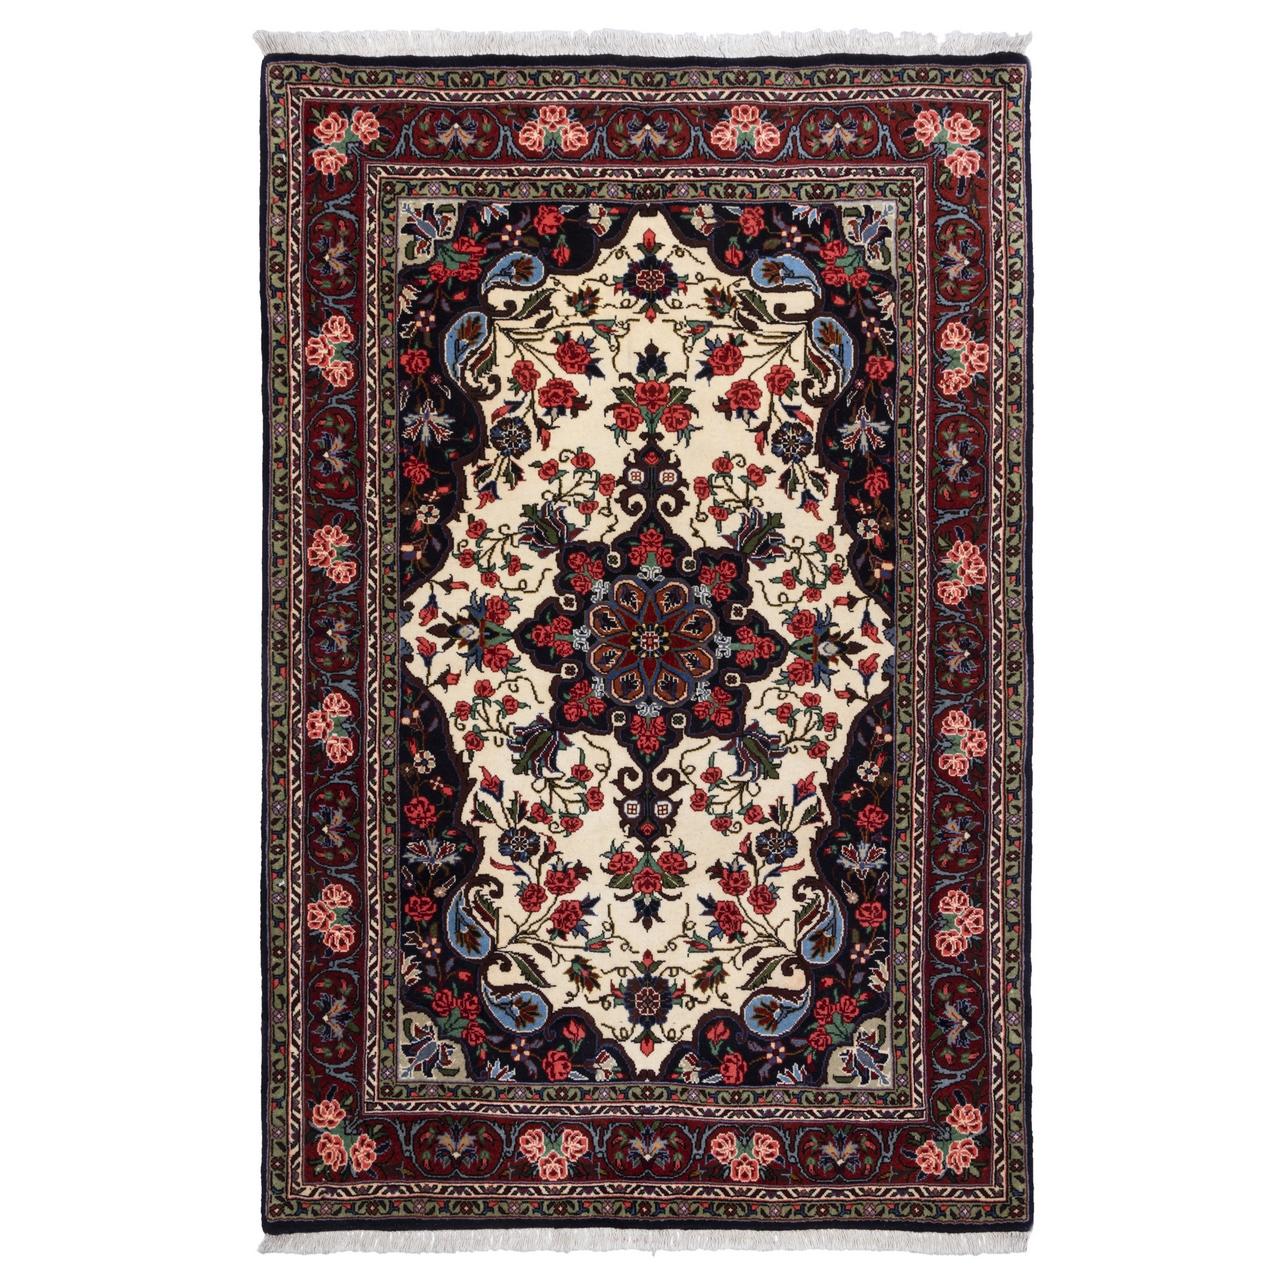 فرش دستباف ذرع و نیم سی پرشیا کد 174393